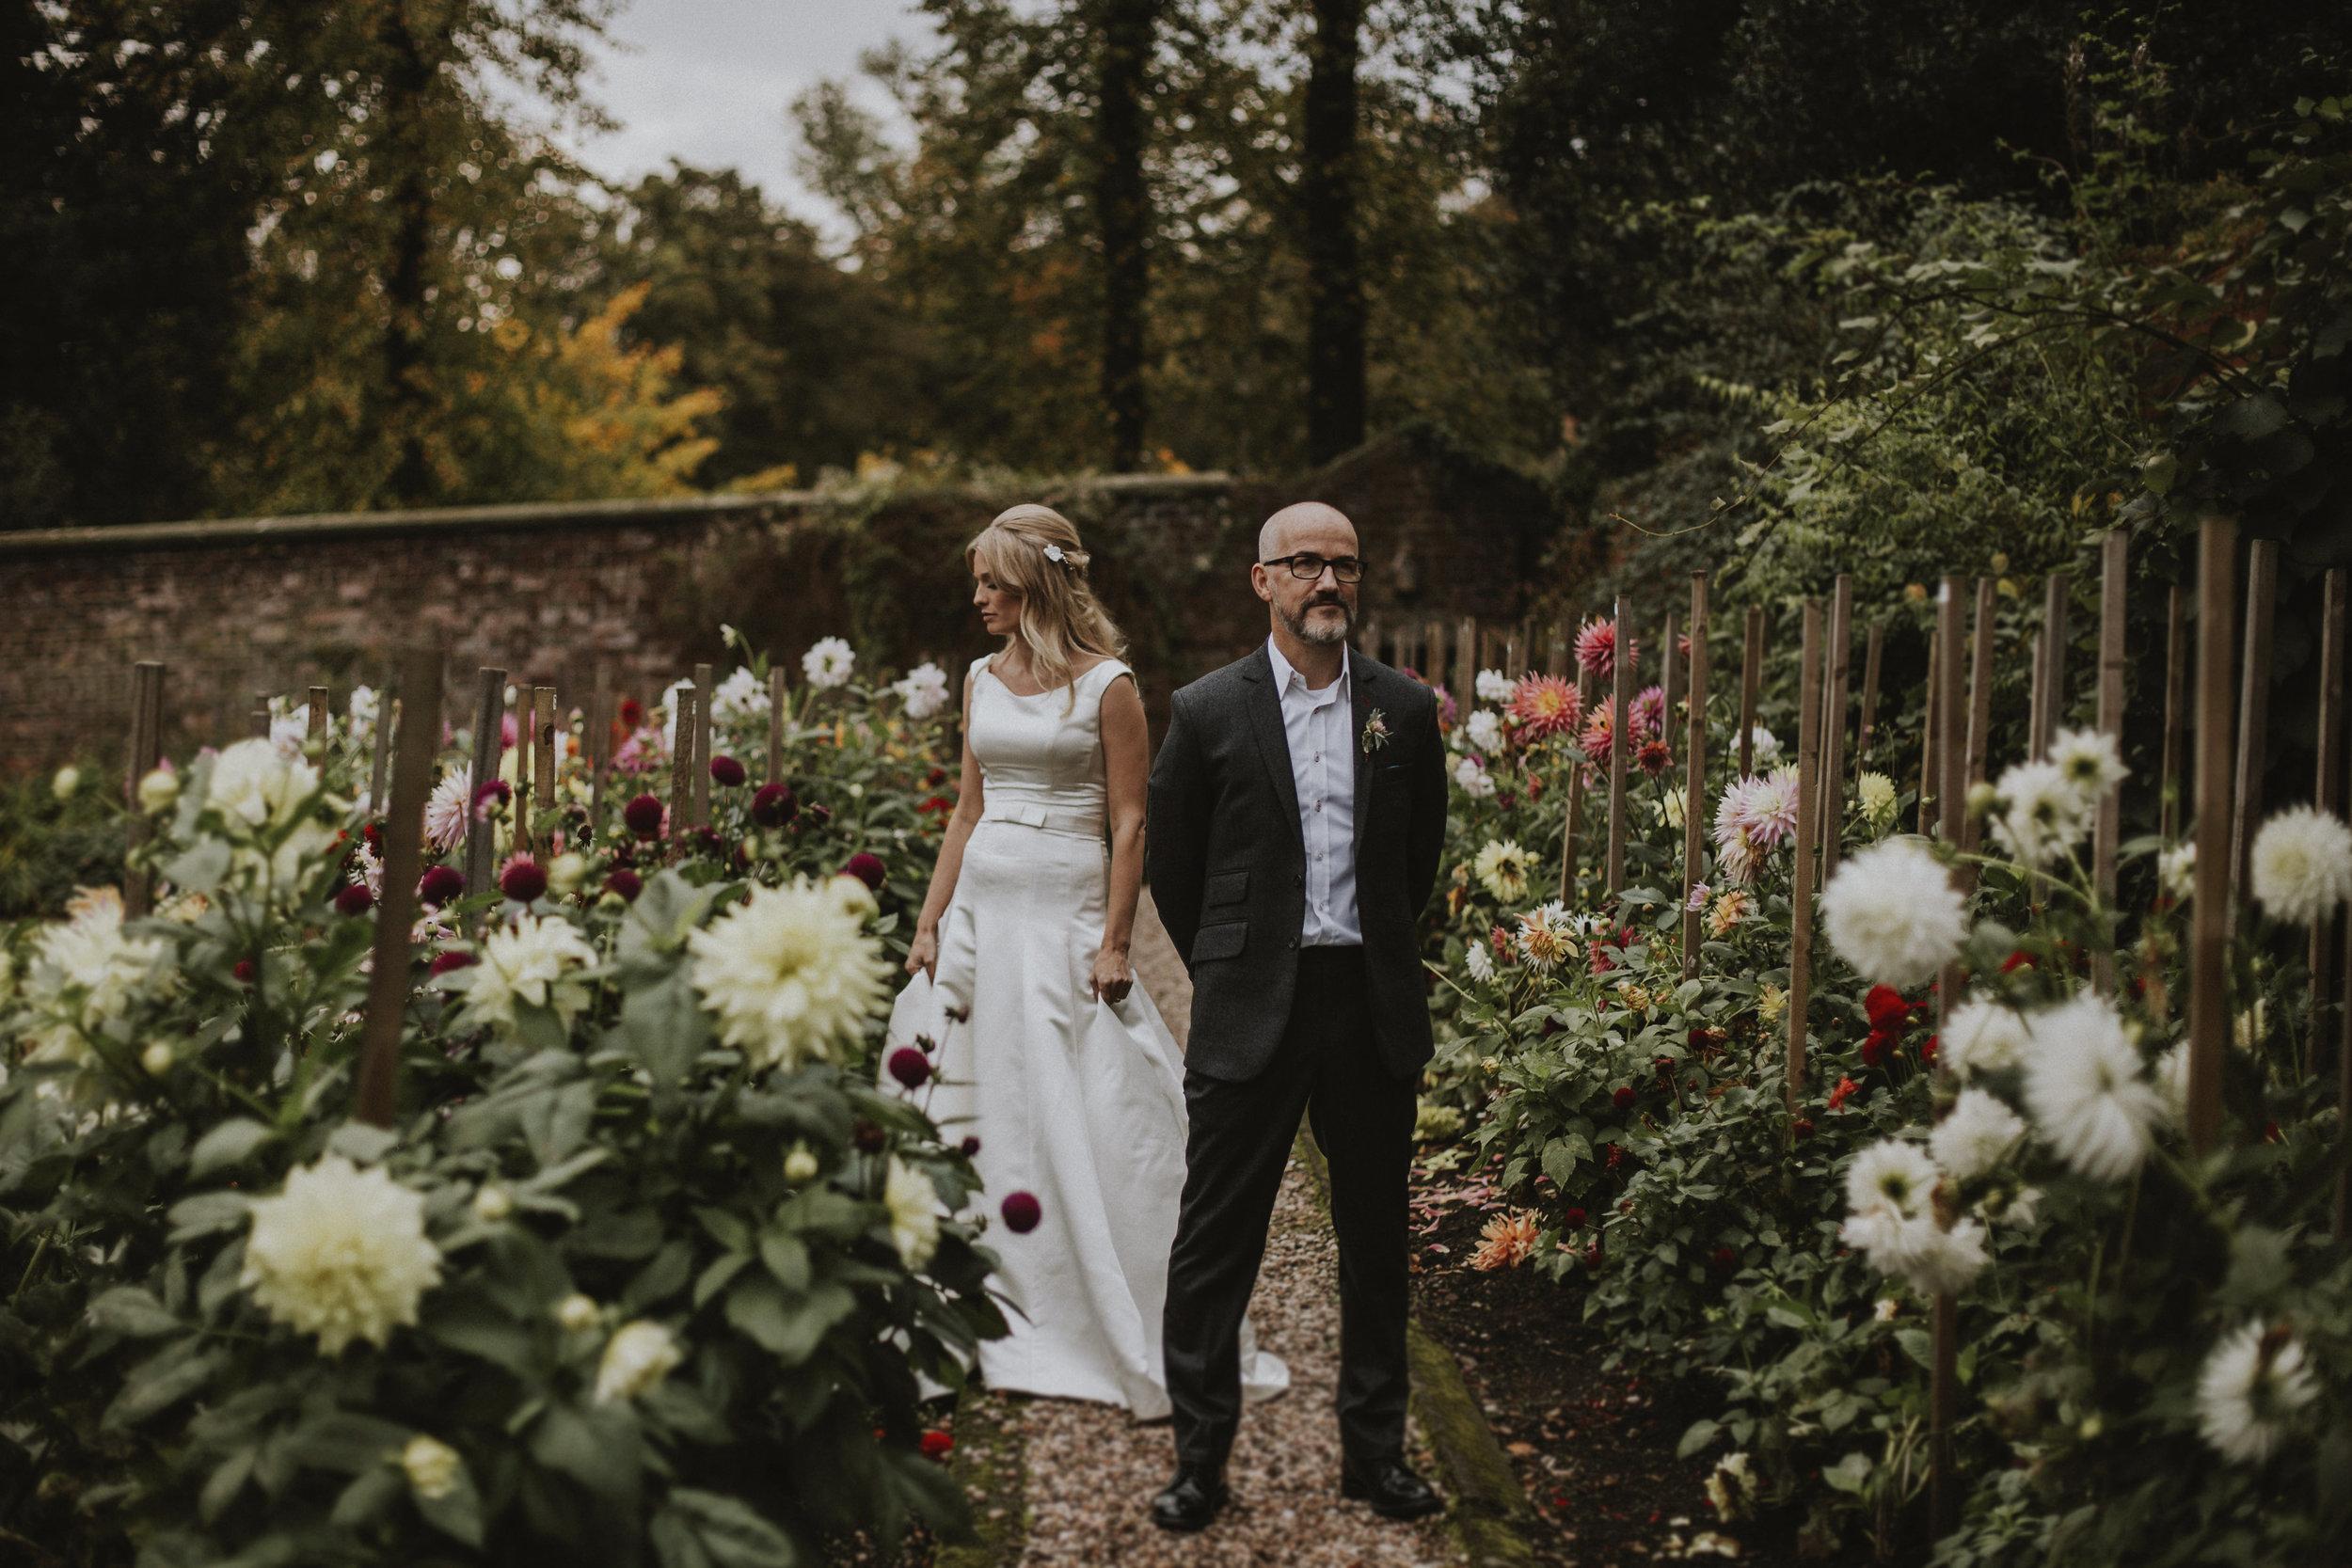 357_wedding_photographer_glasgow.jpg